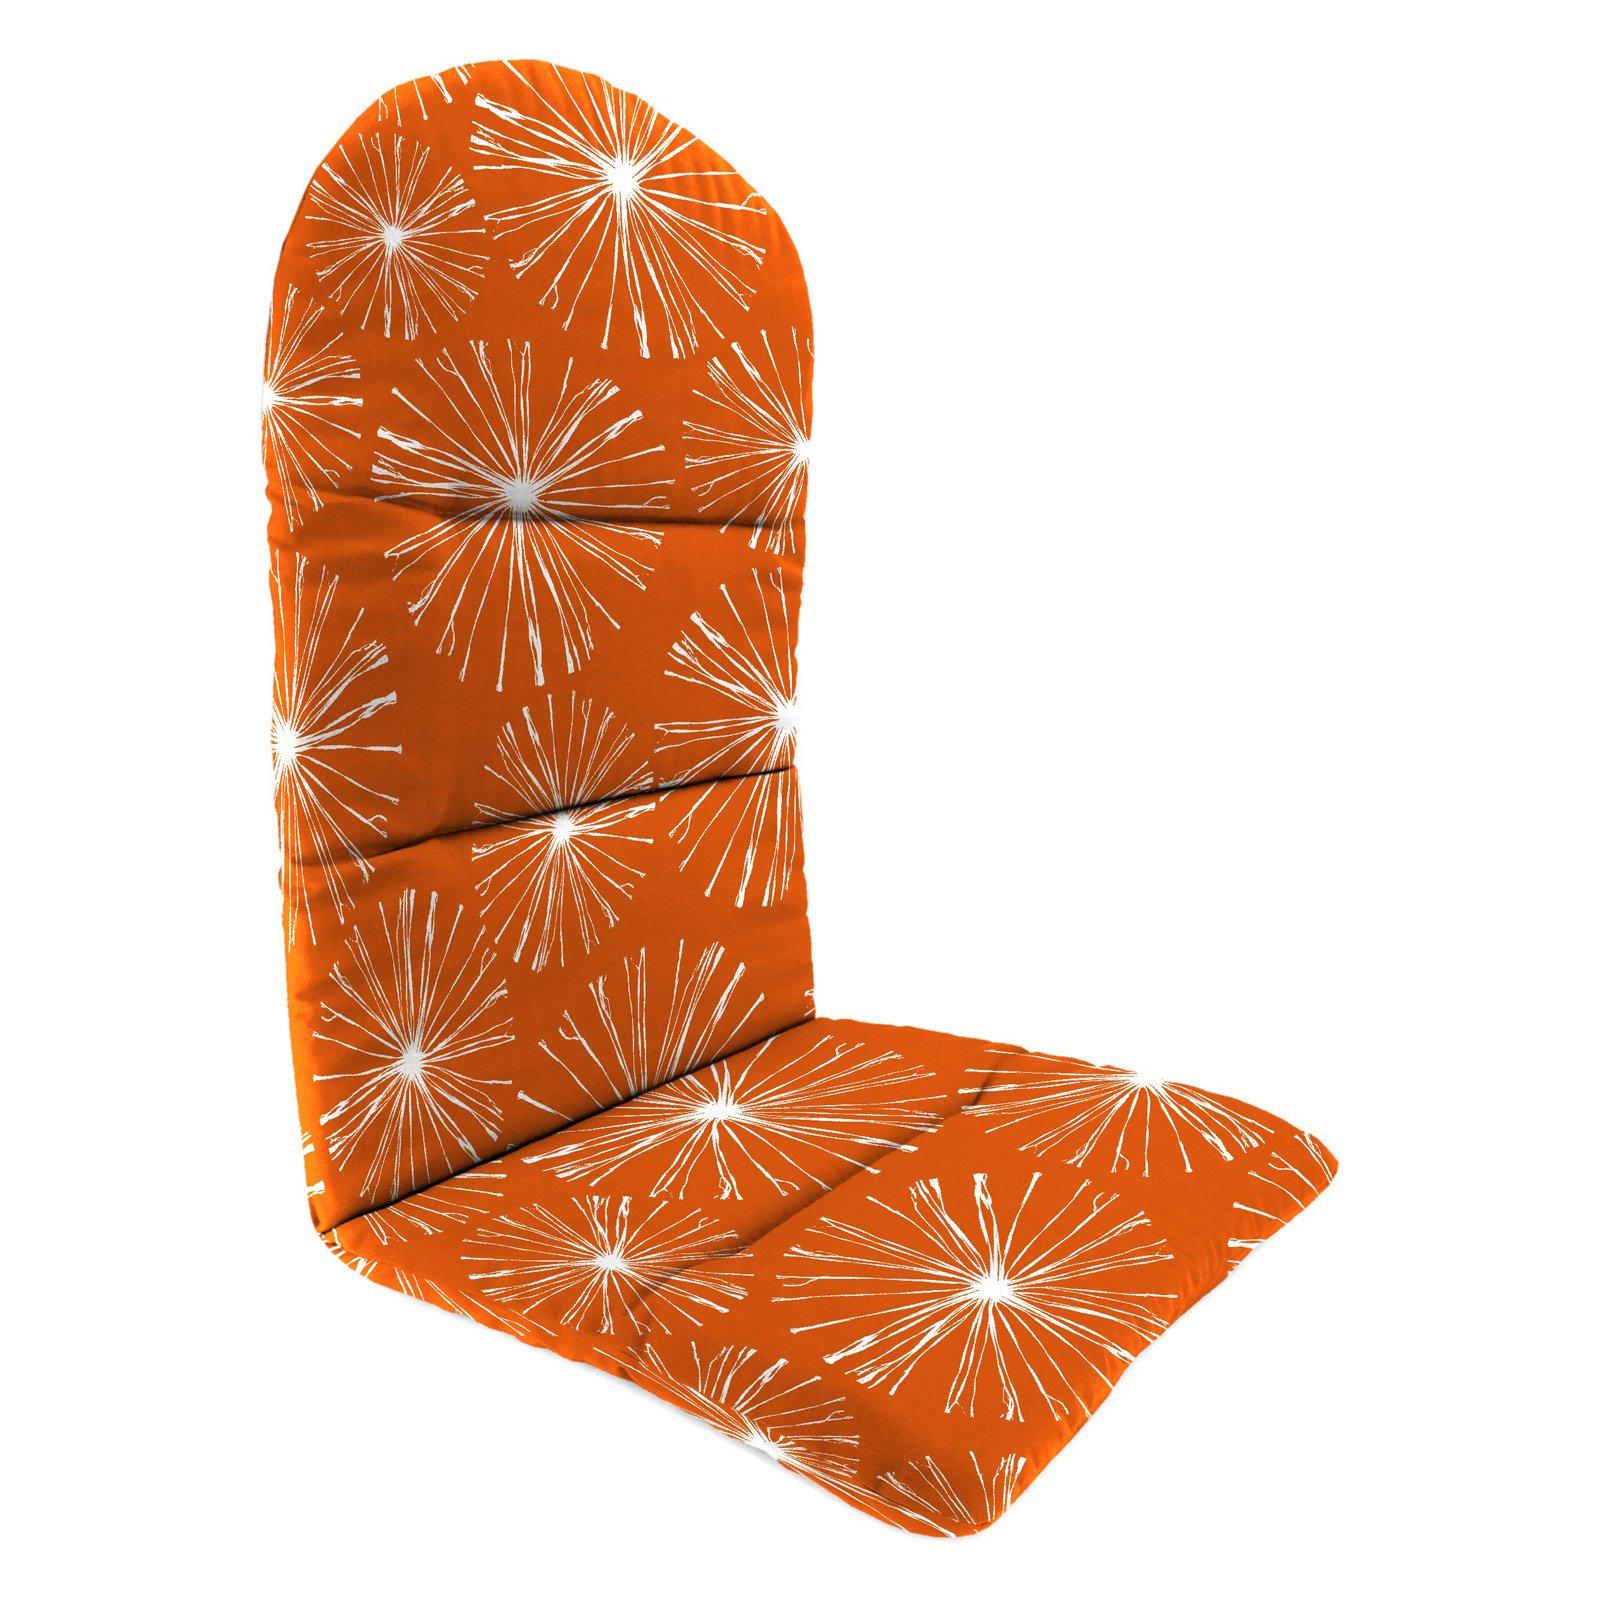 Jordan Manufacturing 49 in. Knife Edge Outdoor Adirondack Chair Cushion - Sparks